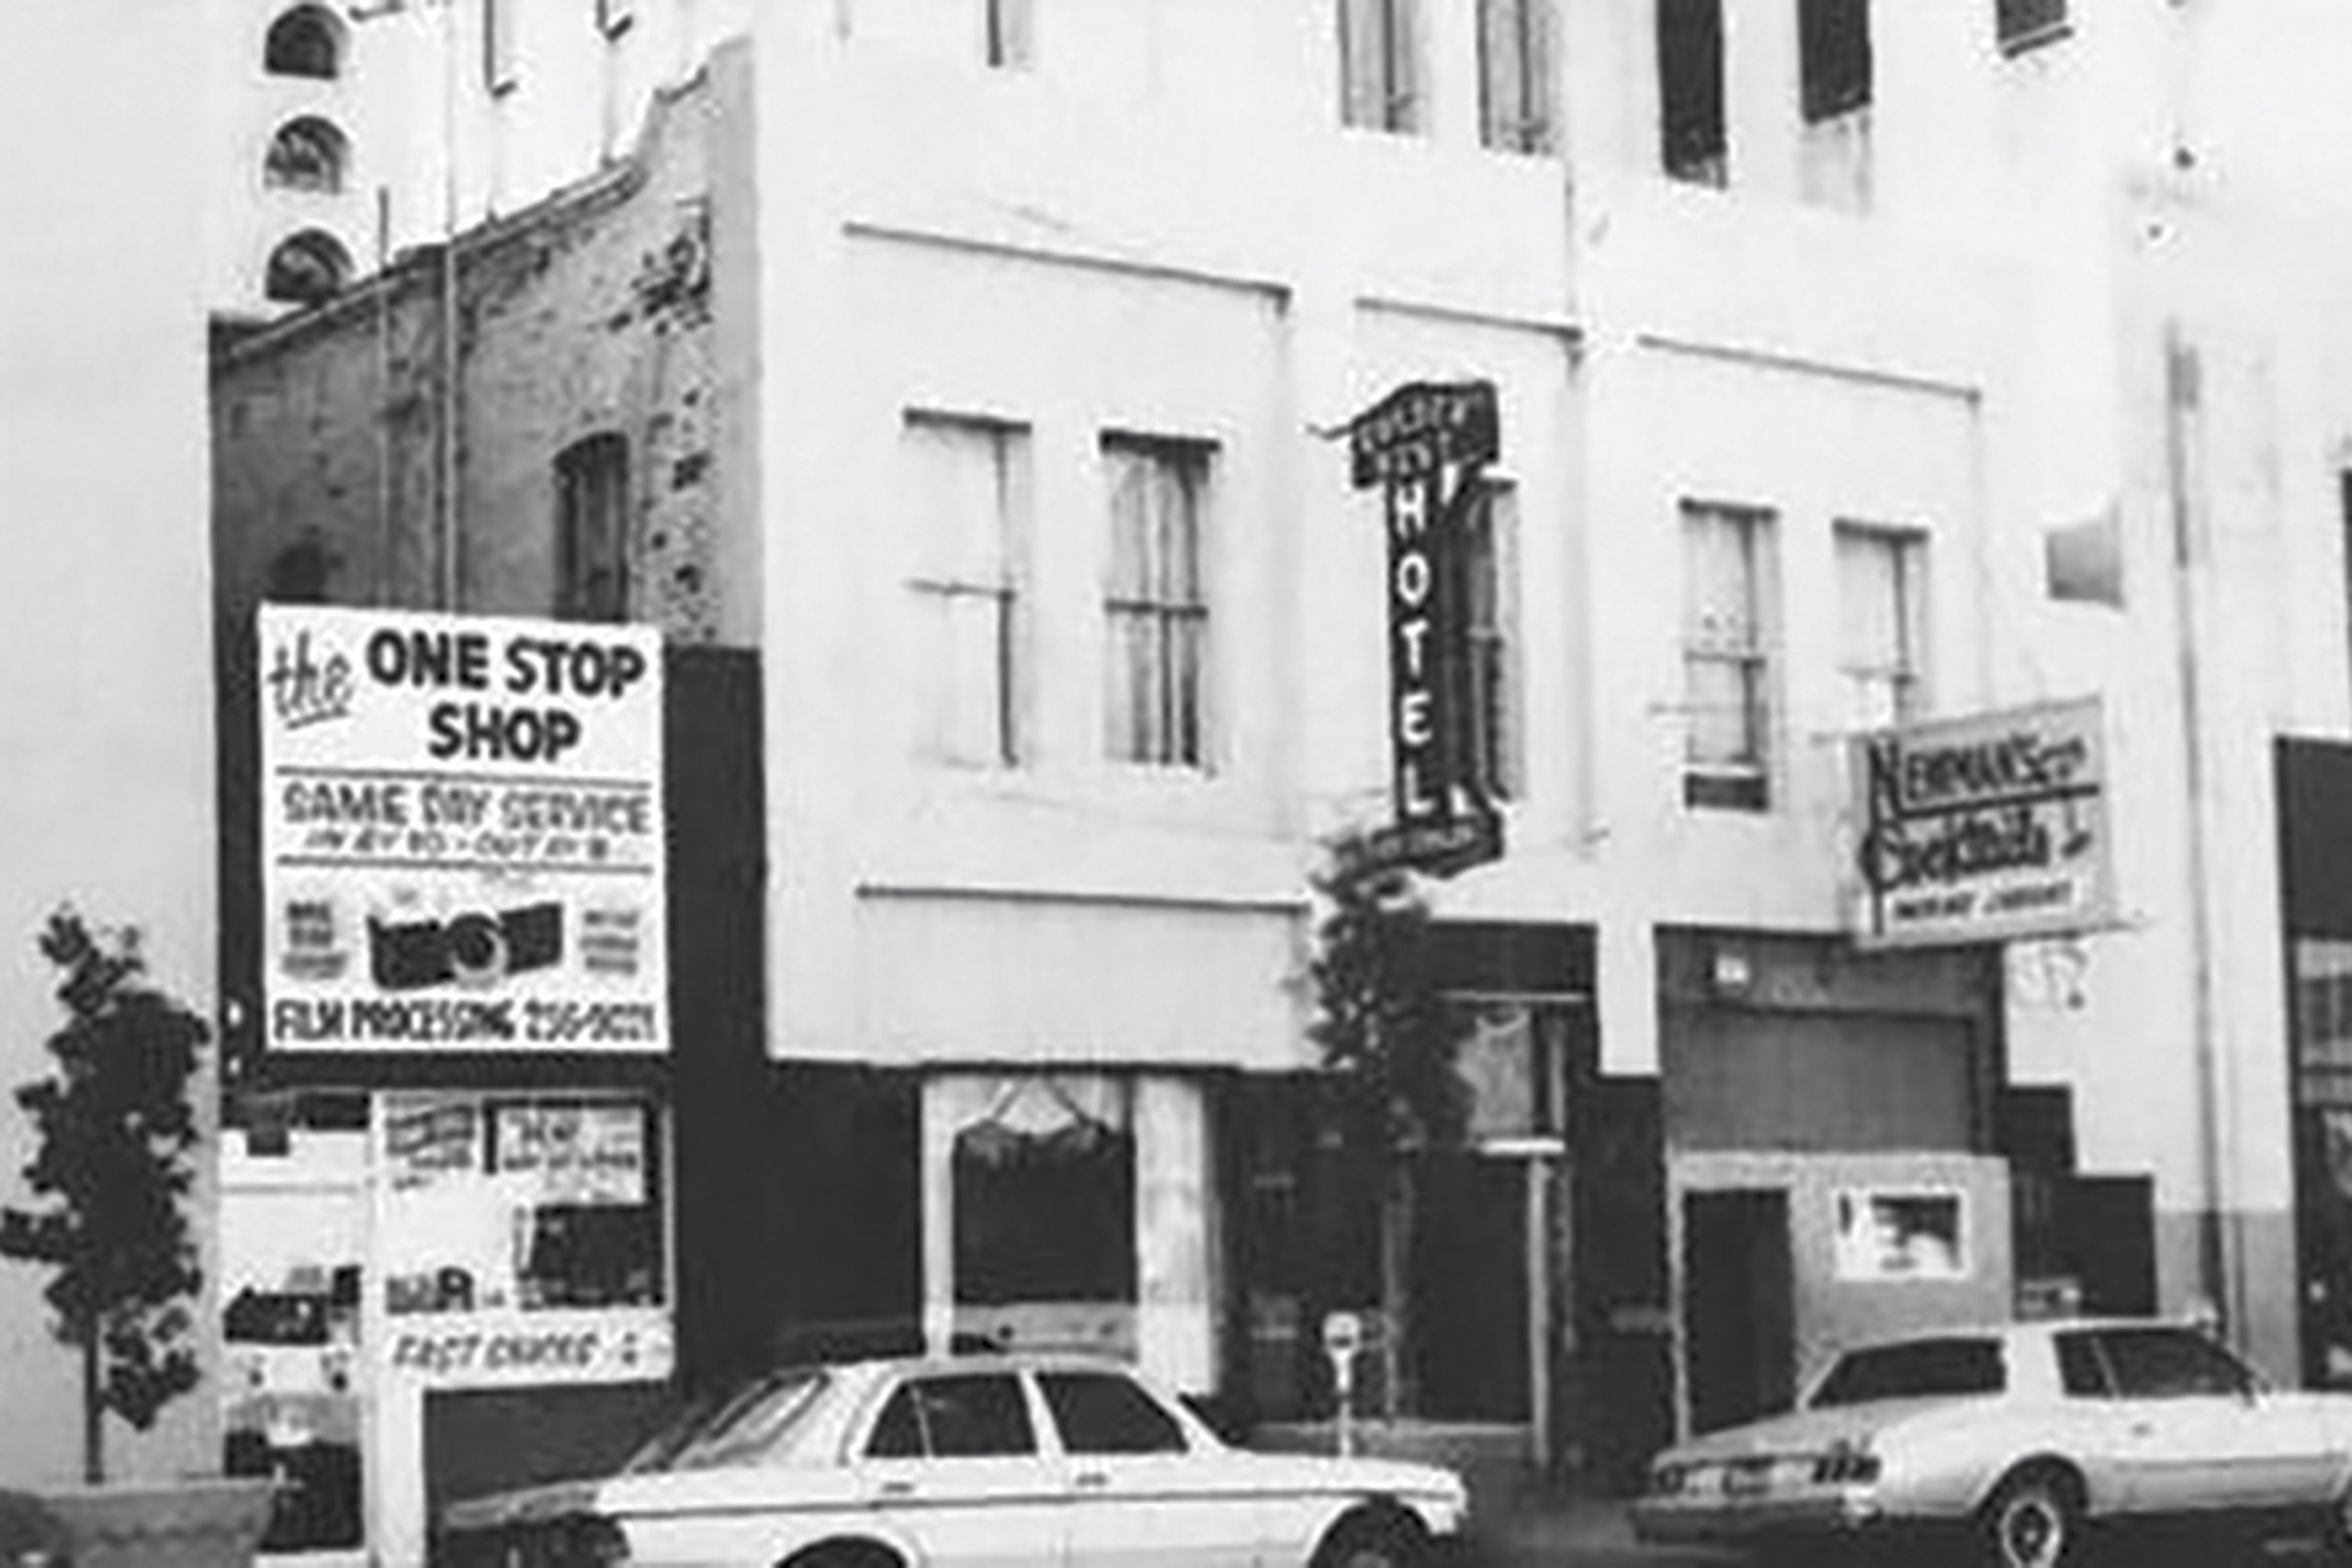 the building in the 1980s; Photo courtesy The Arizona Republic